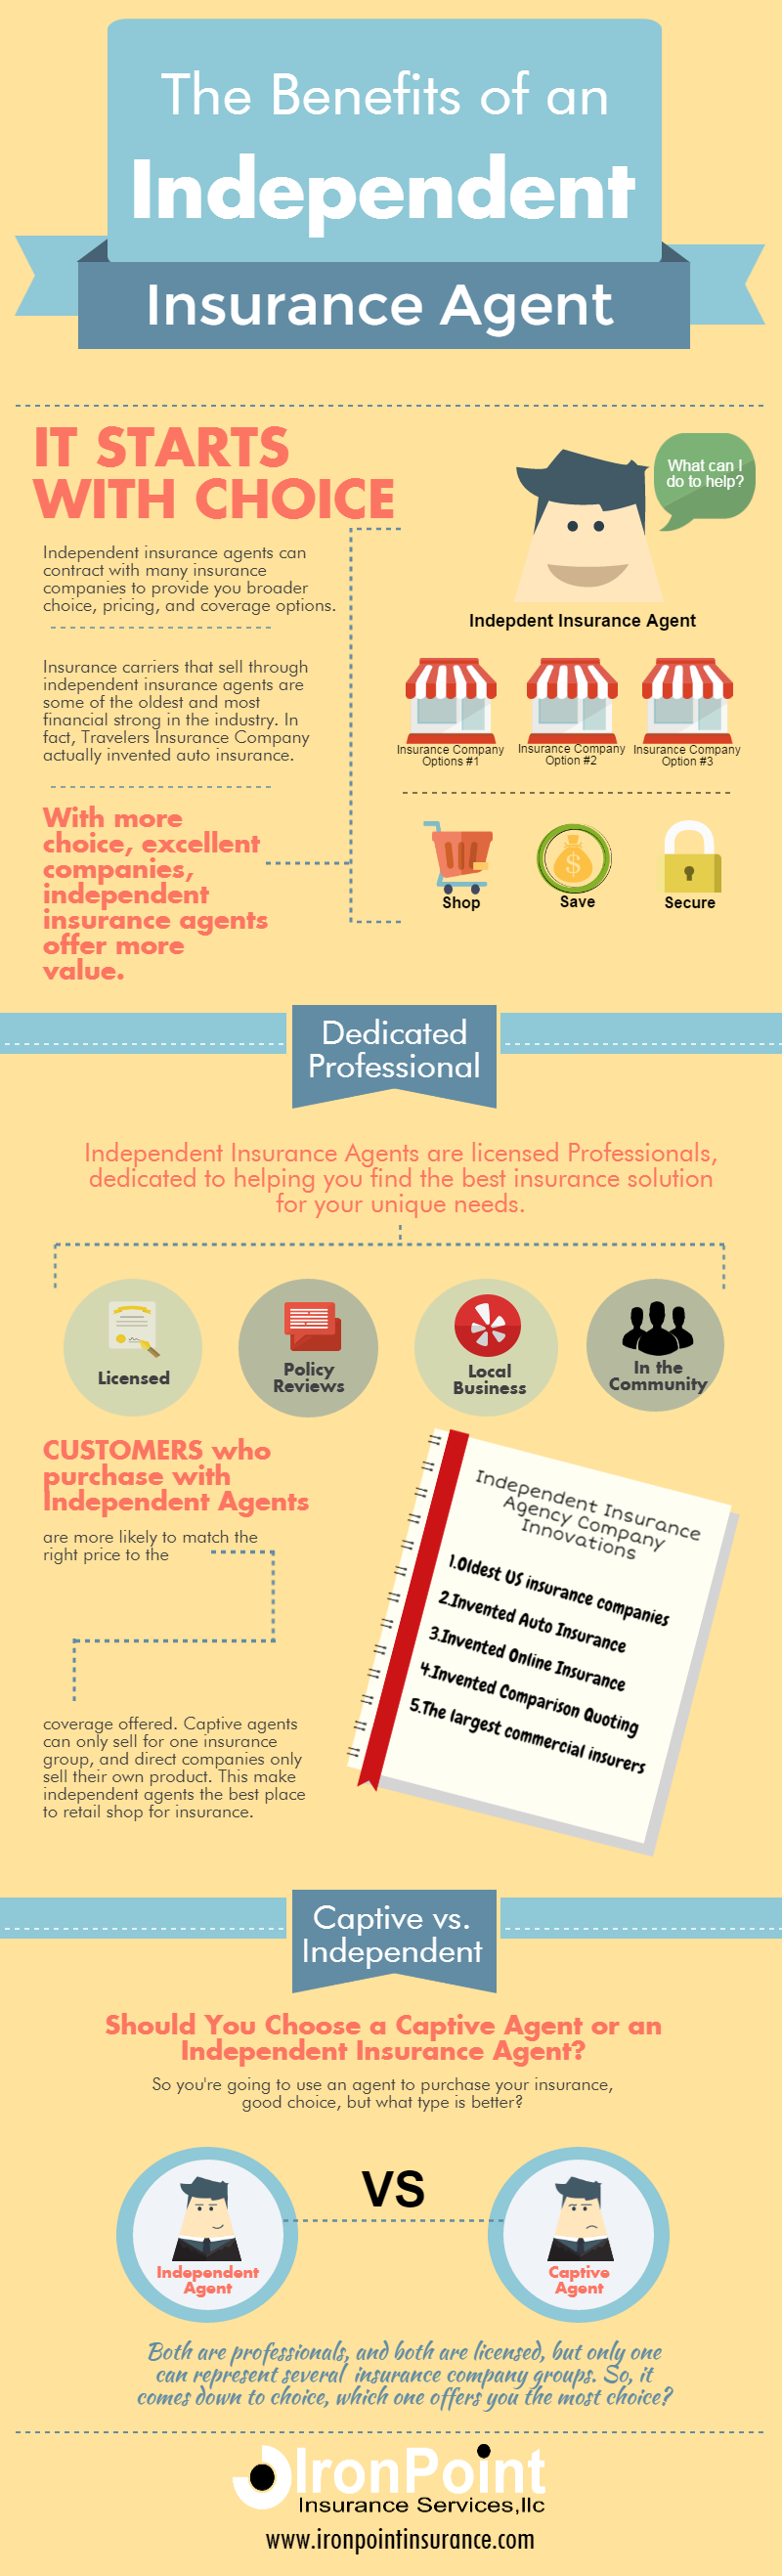 Independent Agent Infographic Benefits